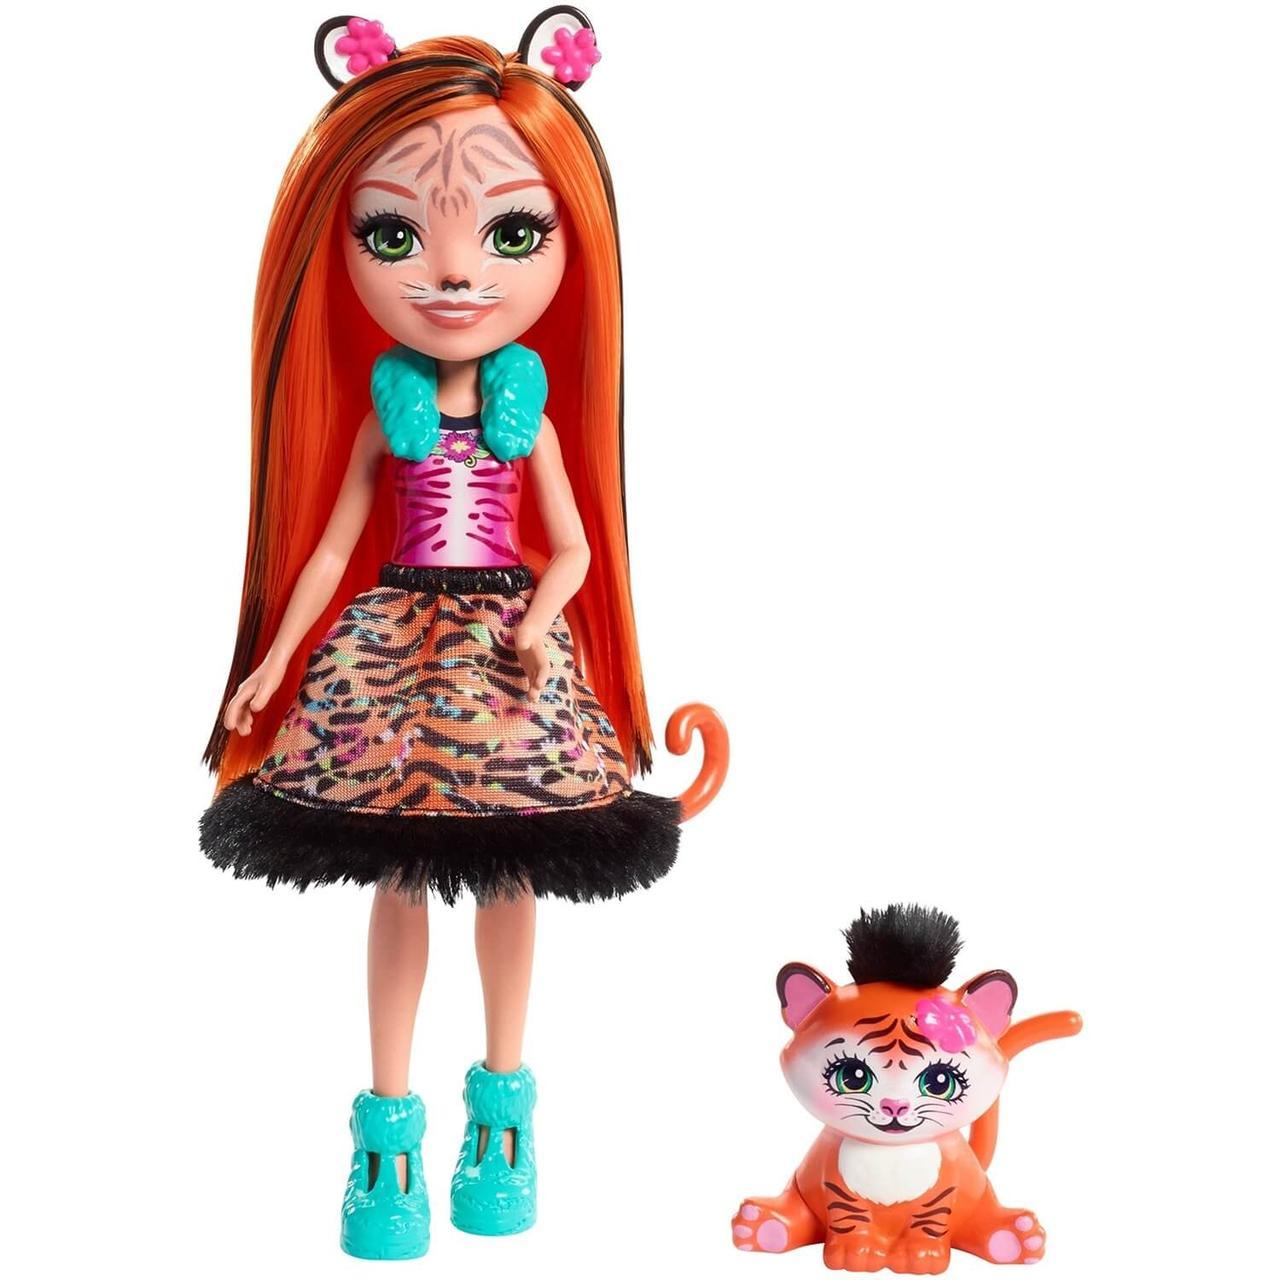 Энчантималс Enchantimals кукла с питомцем Тензи Тигра И Тафт - фото 1